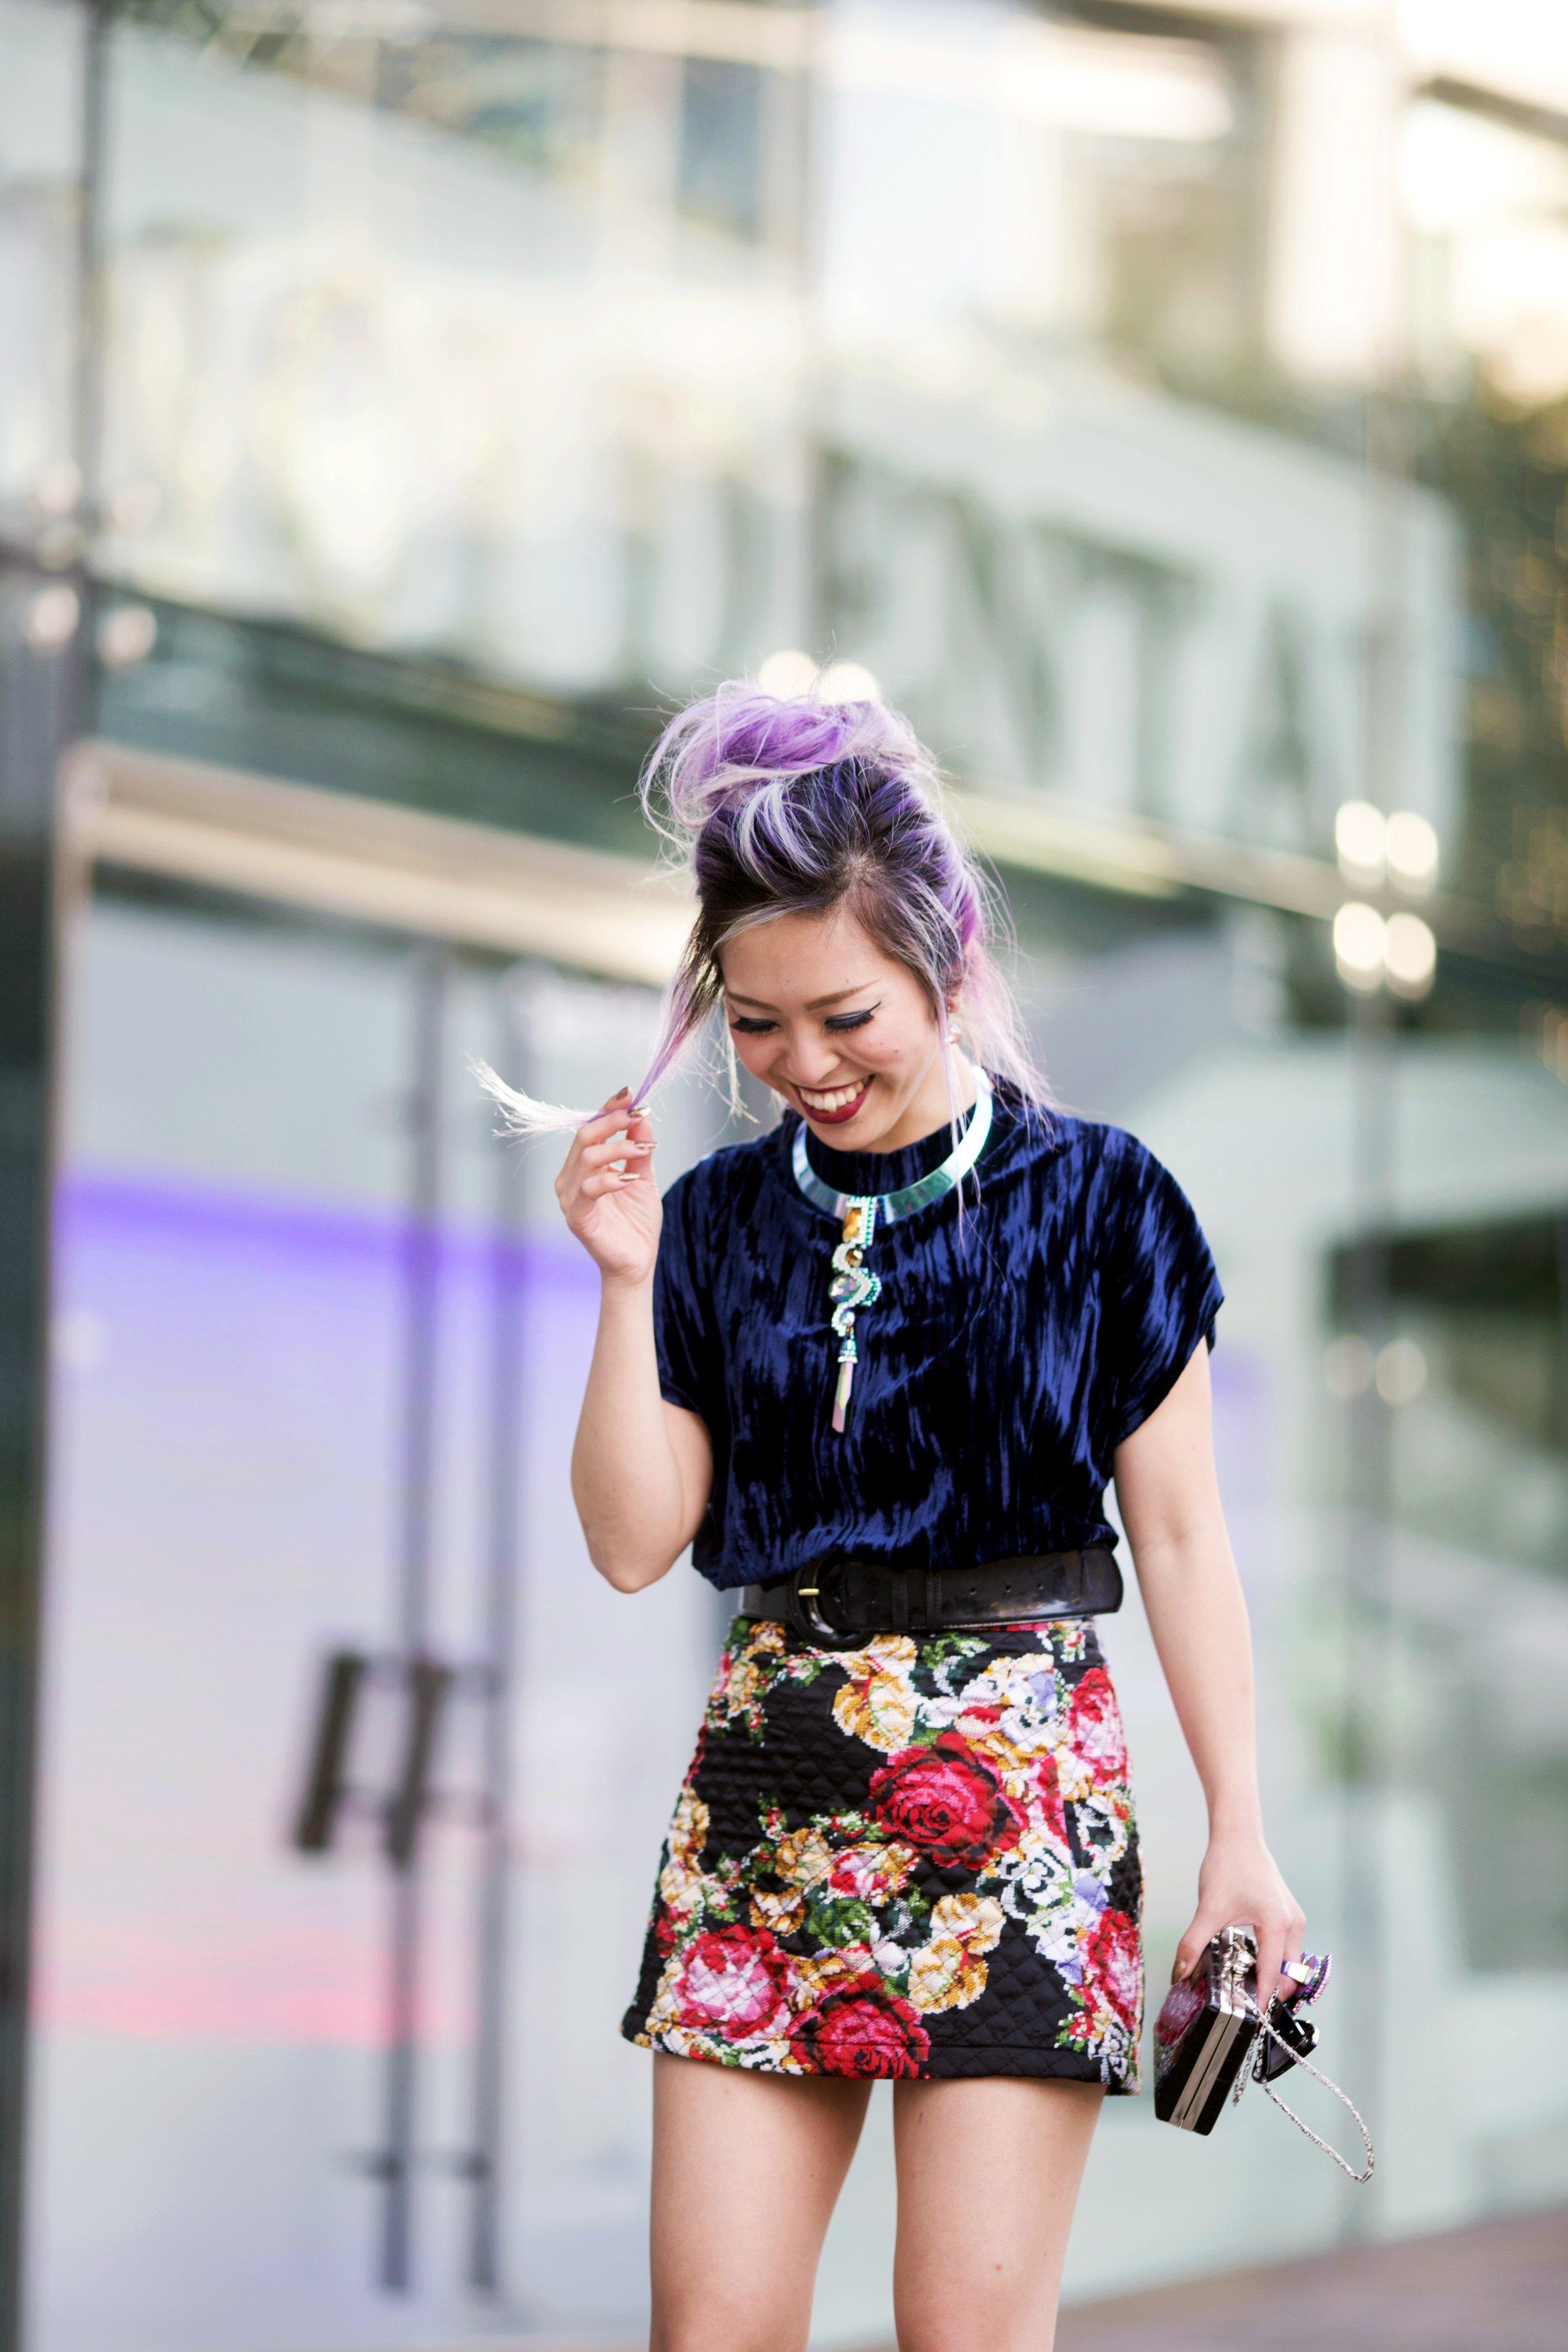 ZARA Blue Velvet Top_Forever 21 Floral Print Mini Skirt_Mango Patent Belt_Kate Spade Sheer Ankle Socks_Qupid Silver Pumps_Aldo Cateye Sunglasses_Swarovski Fluorescent Necklace & Fluorescent Ring_Aika's Love Closet_Seattle Fashion Blogger_Japanese_Lavender Hair_Mermaid Hair 11